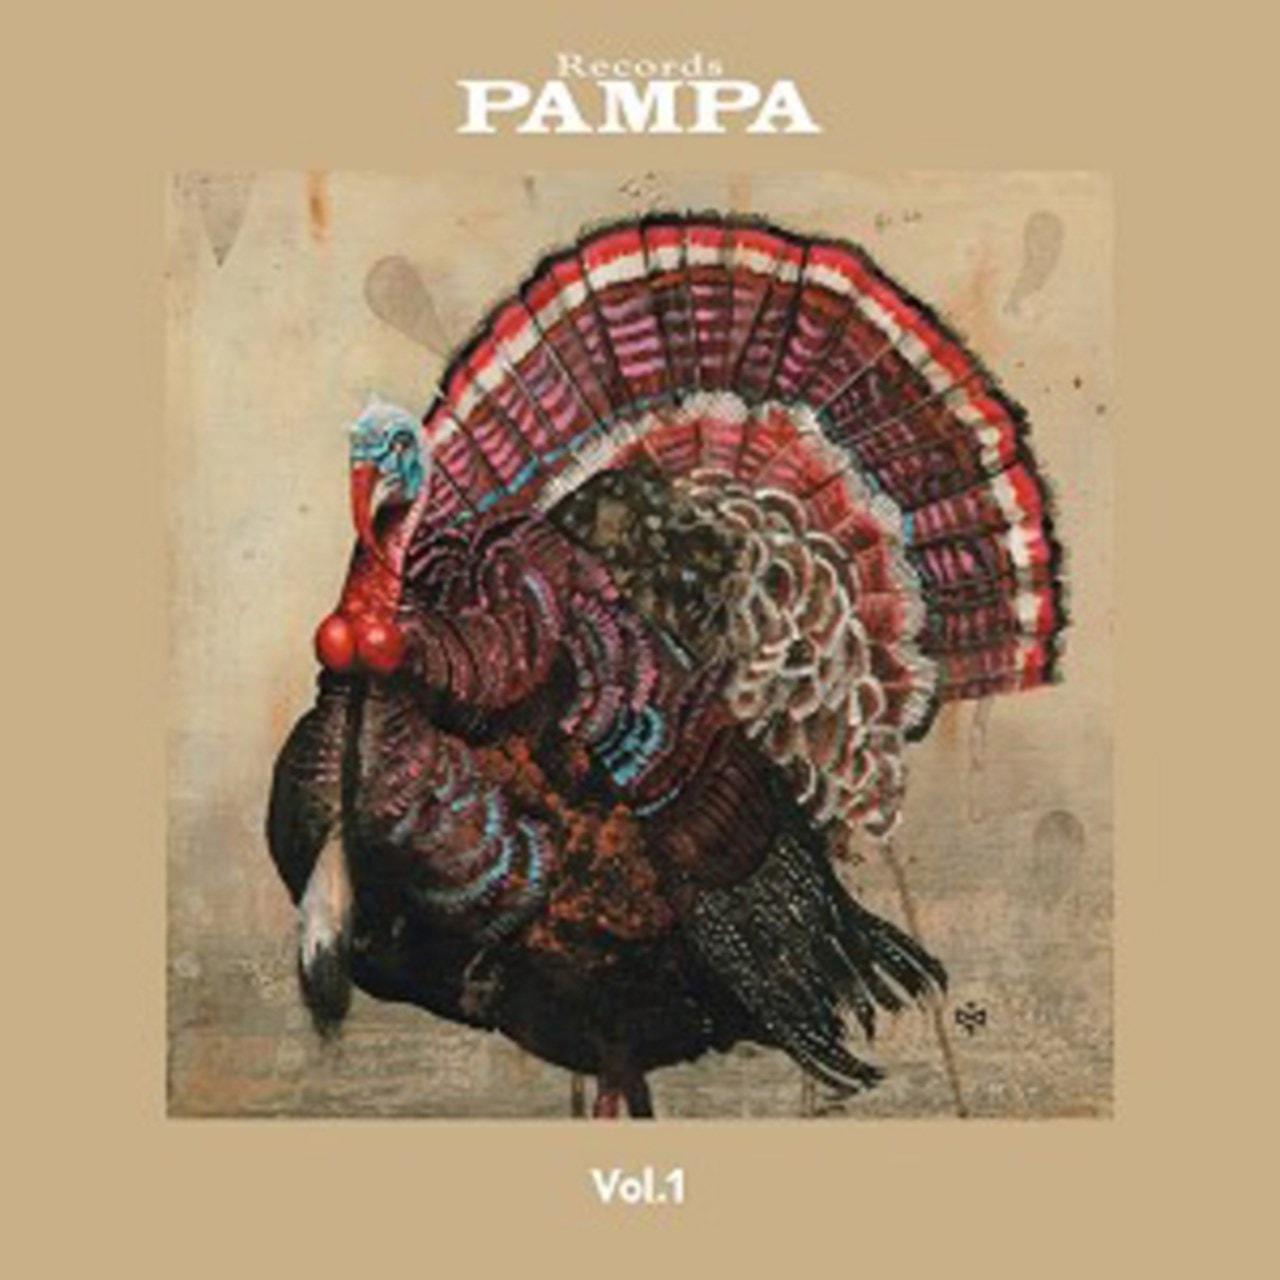 Pampa - Volume 1 - 1